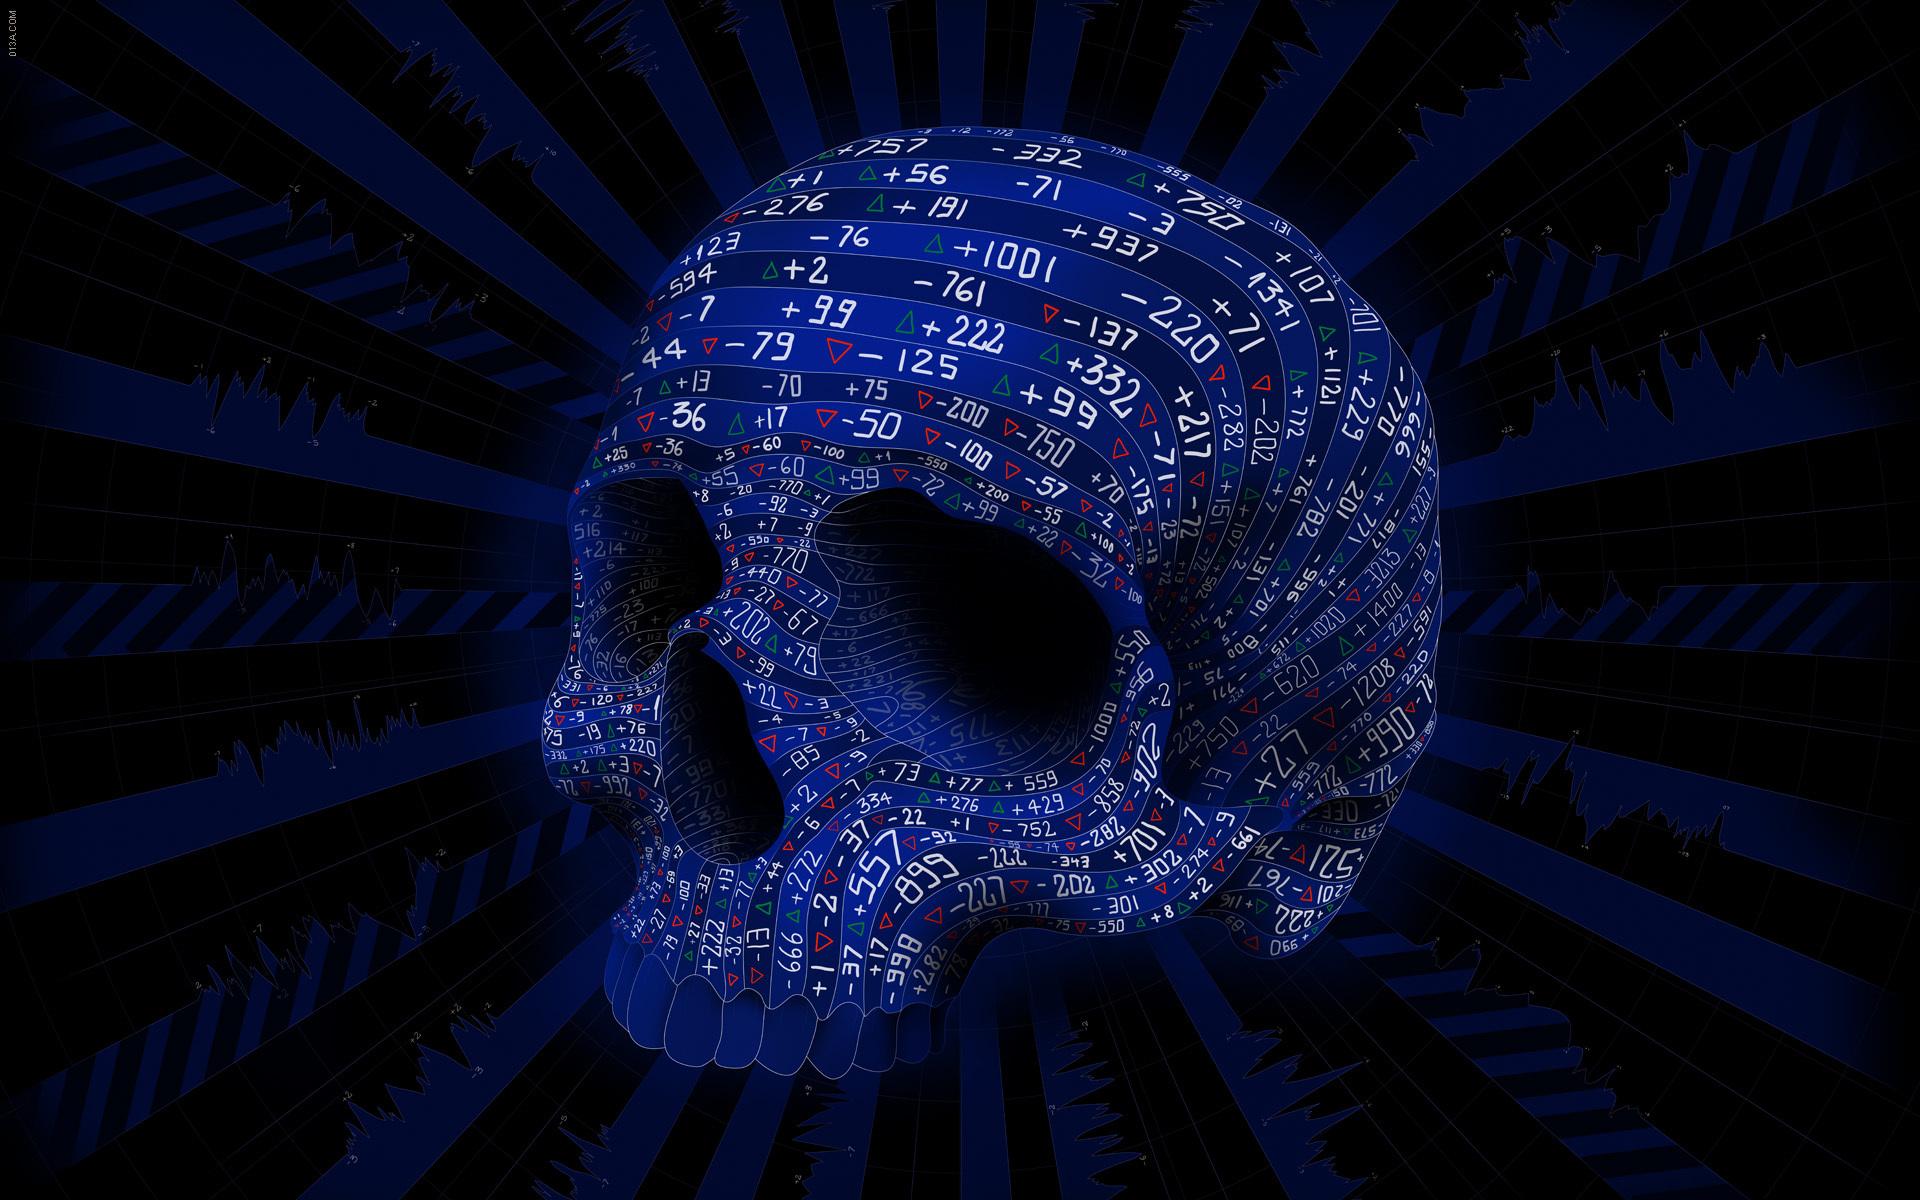 Artistic Business Cgi Digital Art Mathematics Number Psychedelic 1920x1200